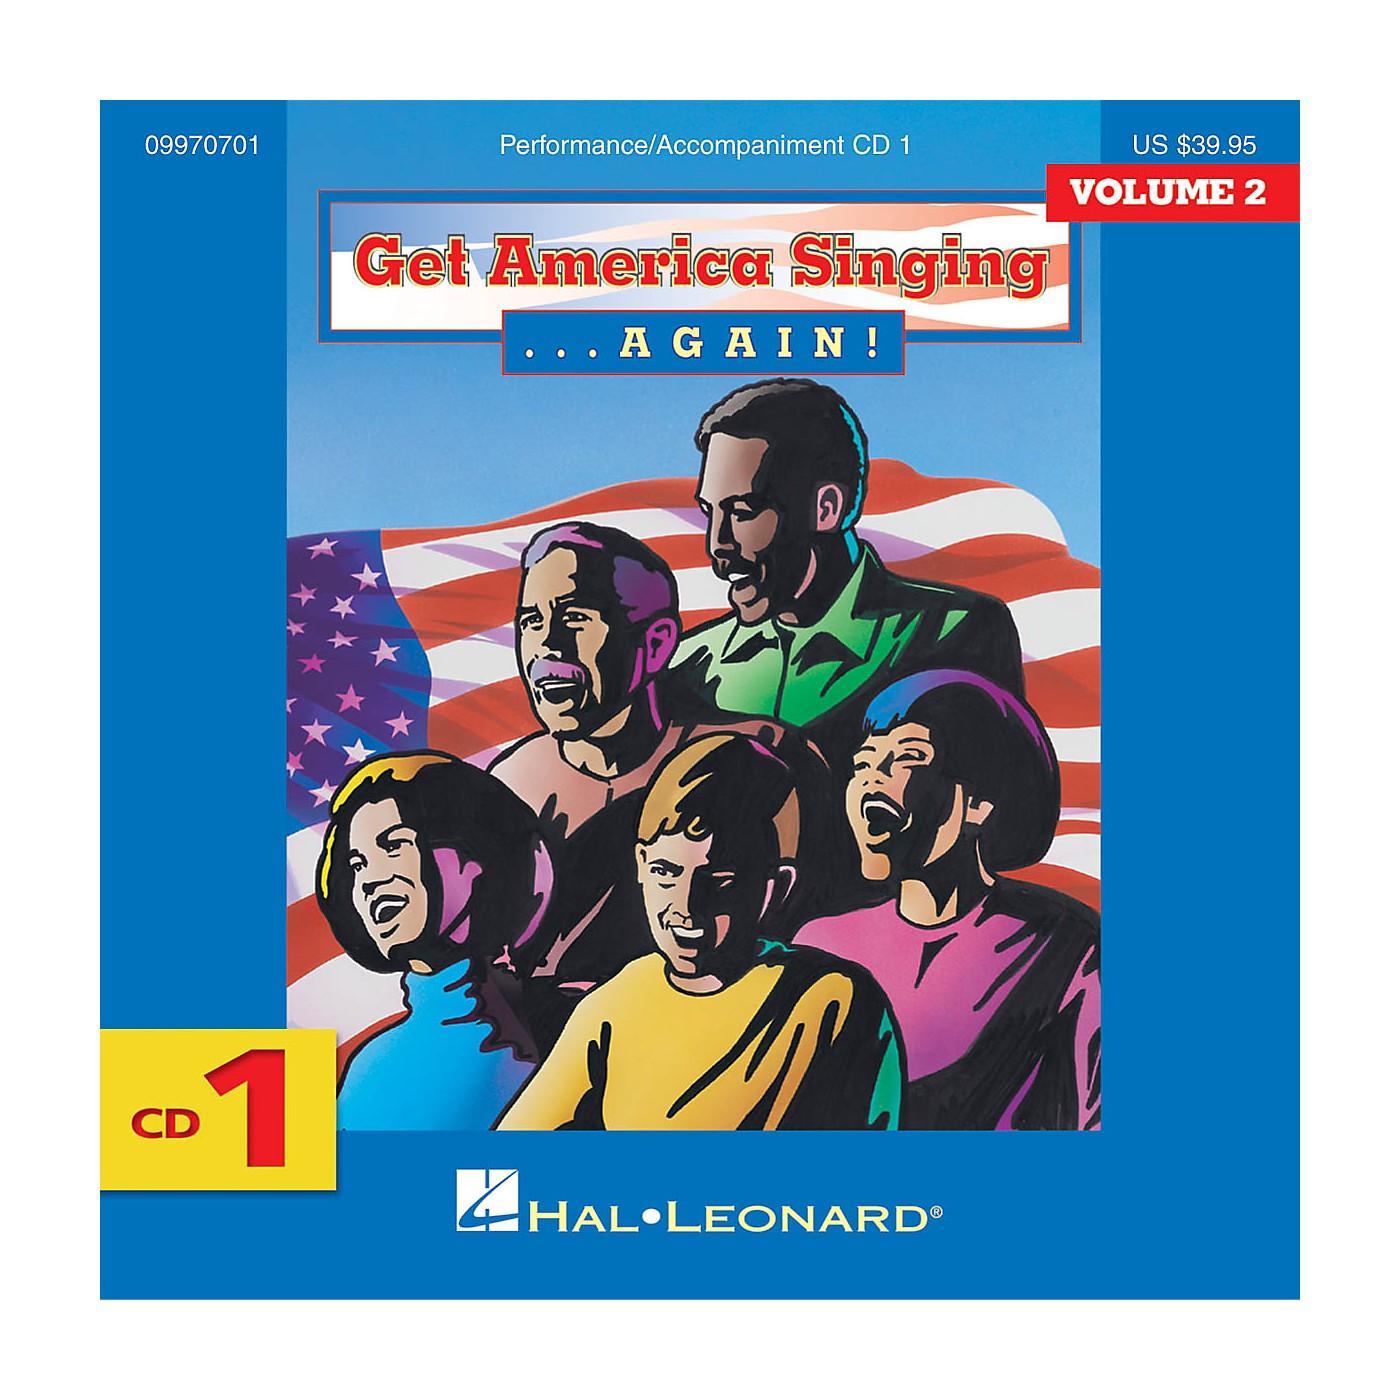 Hal Leonard Get America Singing Again Vol 2 CD One Vol 2 CD 1 thumbnail